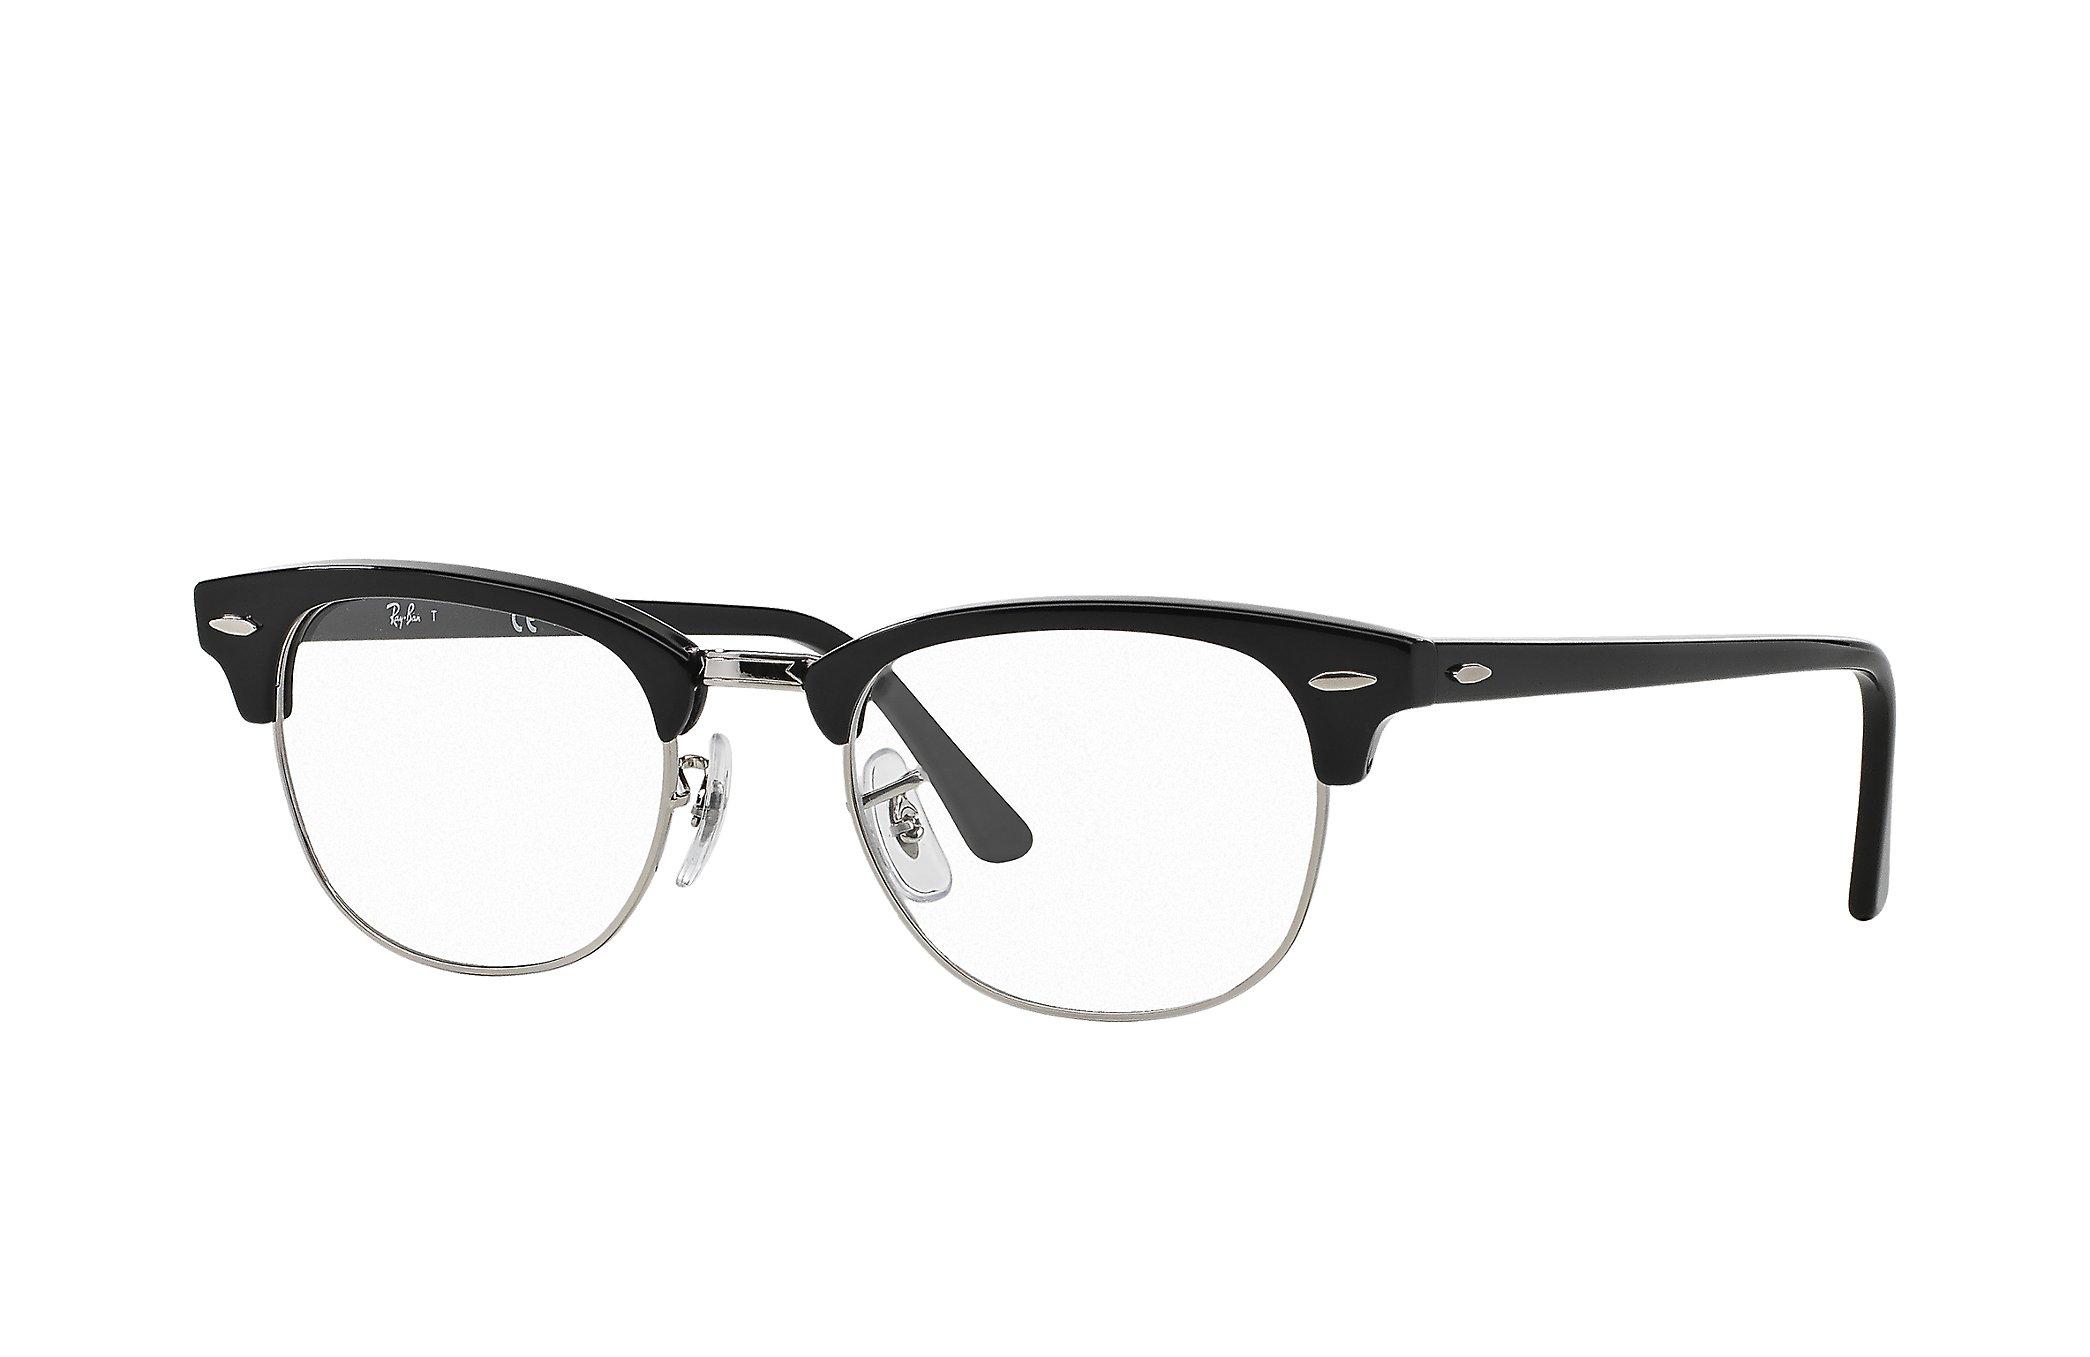 RAY BAN READING GLASSES +1.50 RX5154